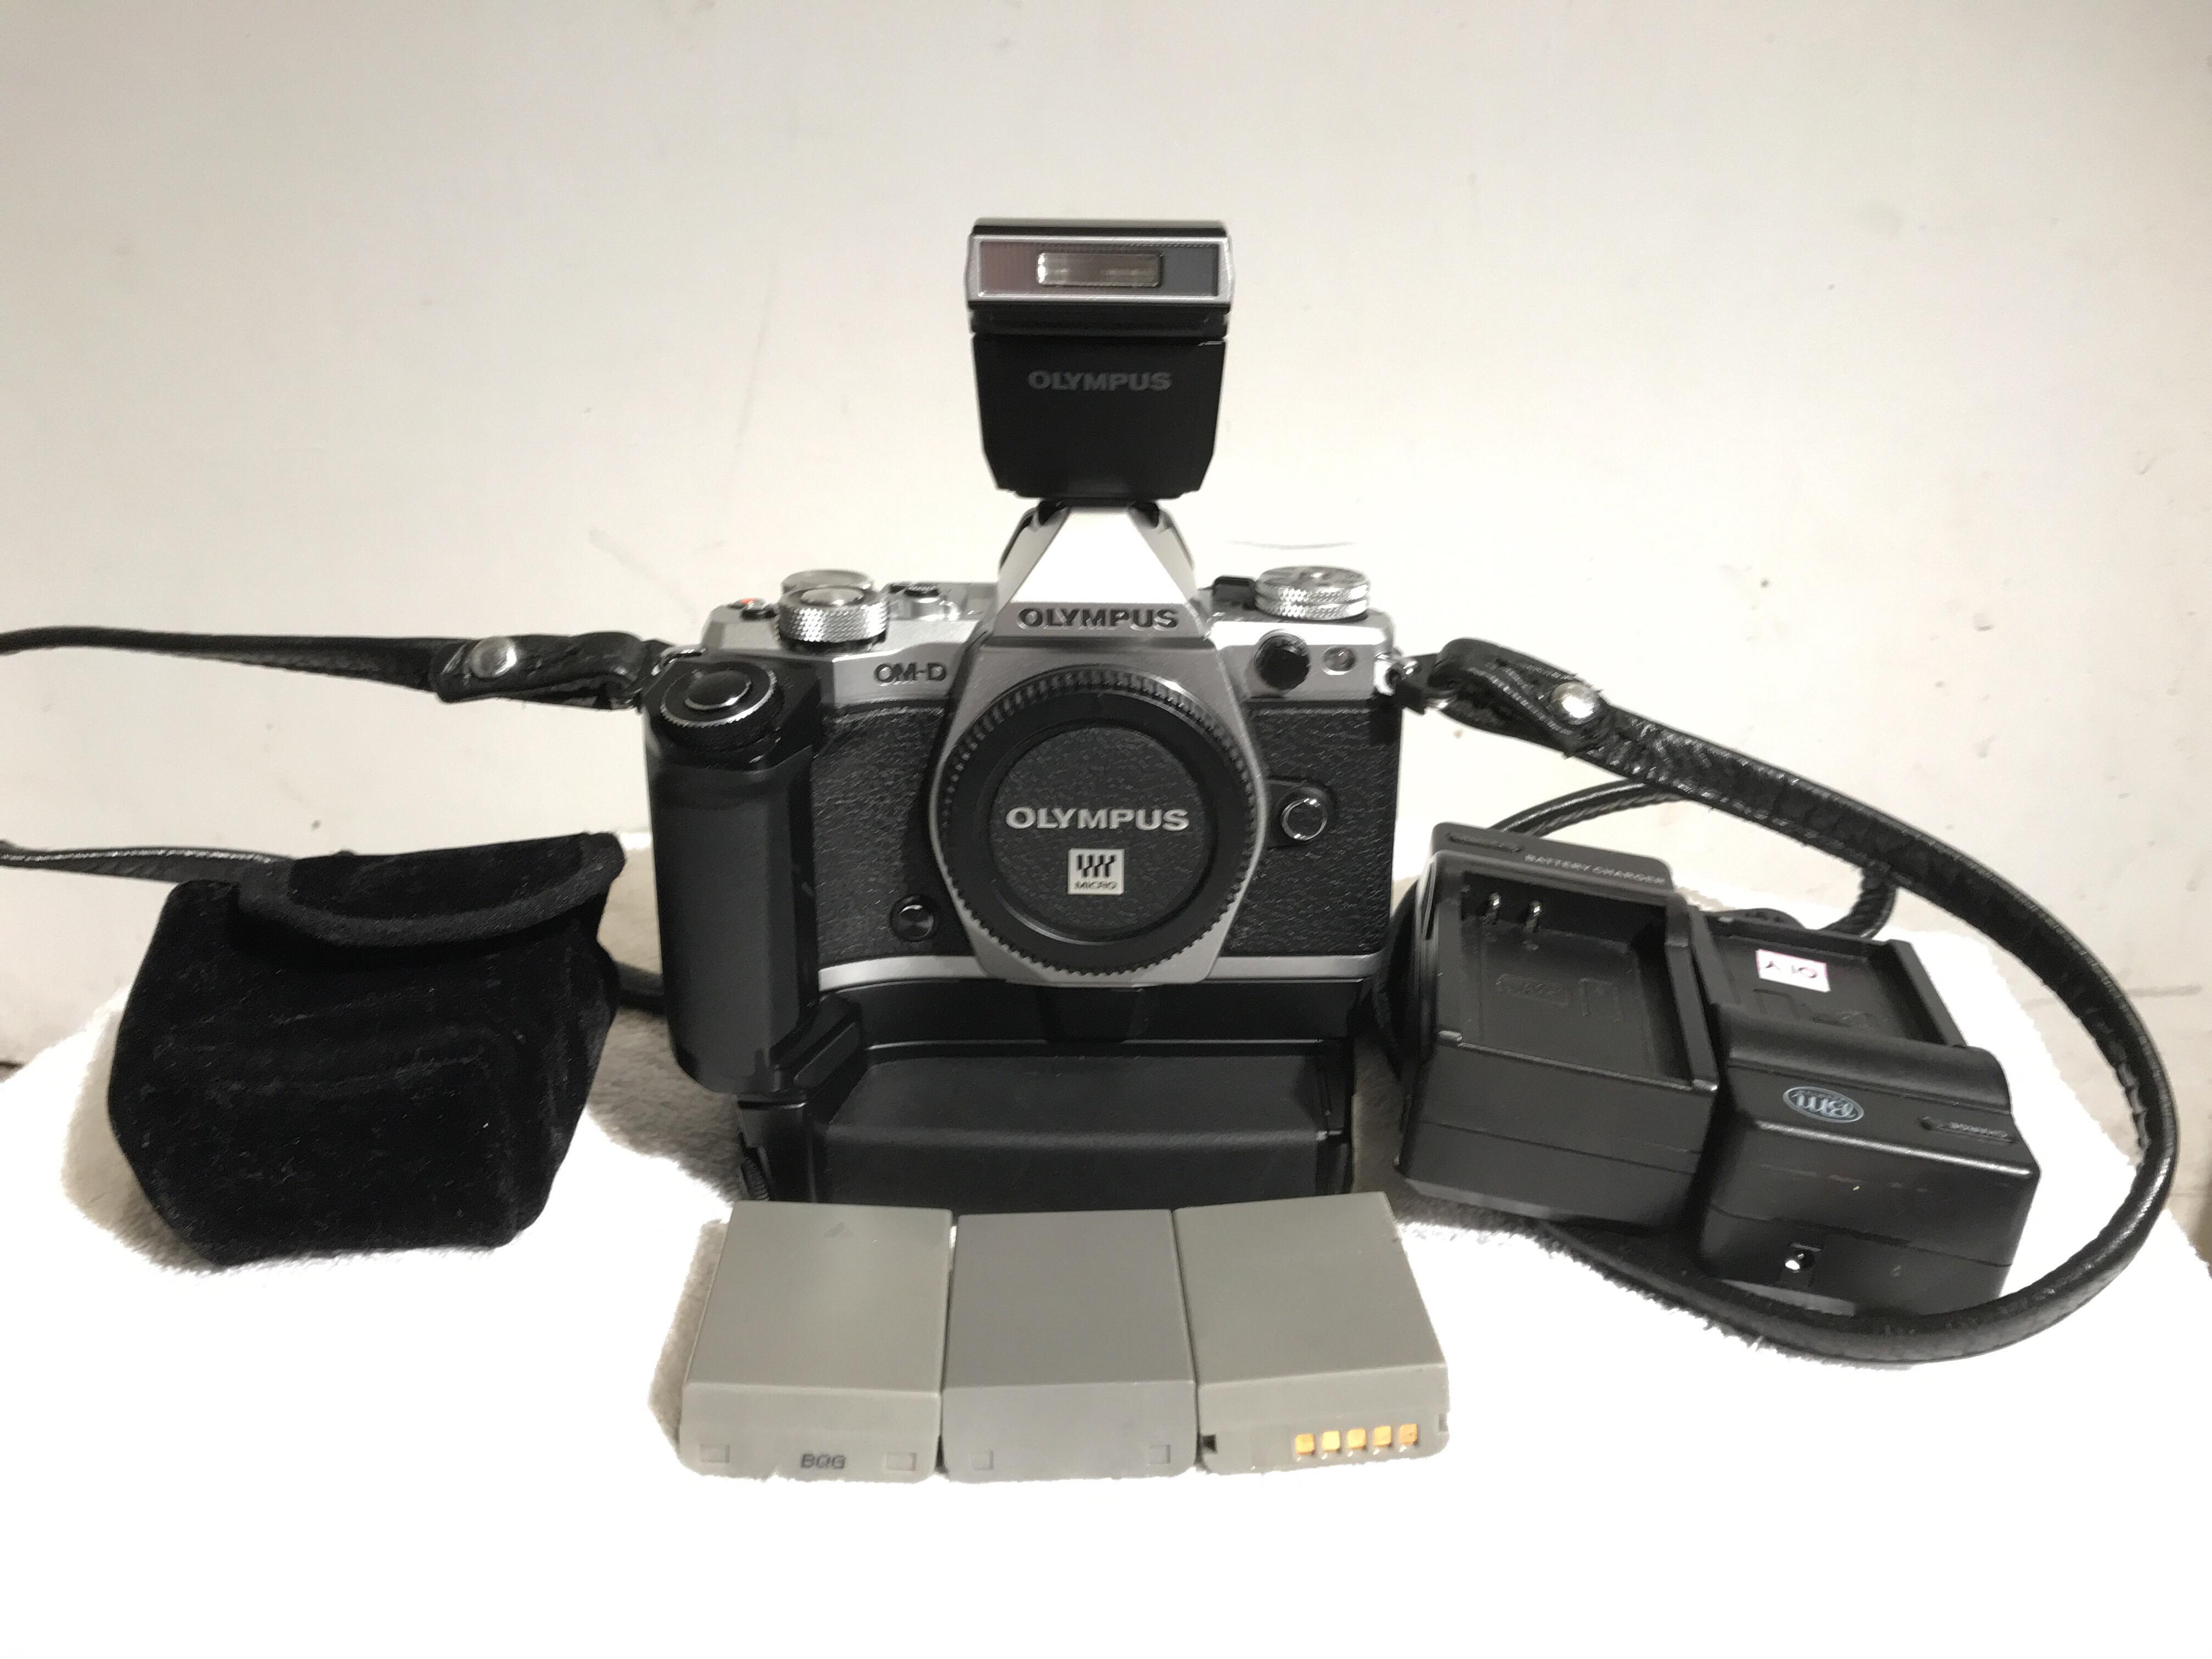 FS: Olympus OM-D E-M5 Mark II w HLD-8 $750: For Sale and Wanted